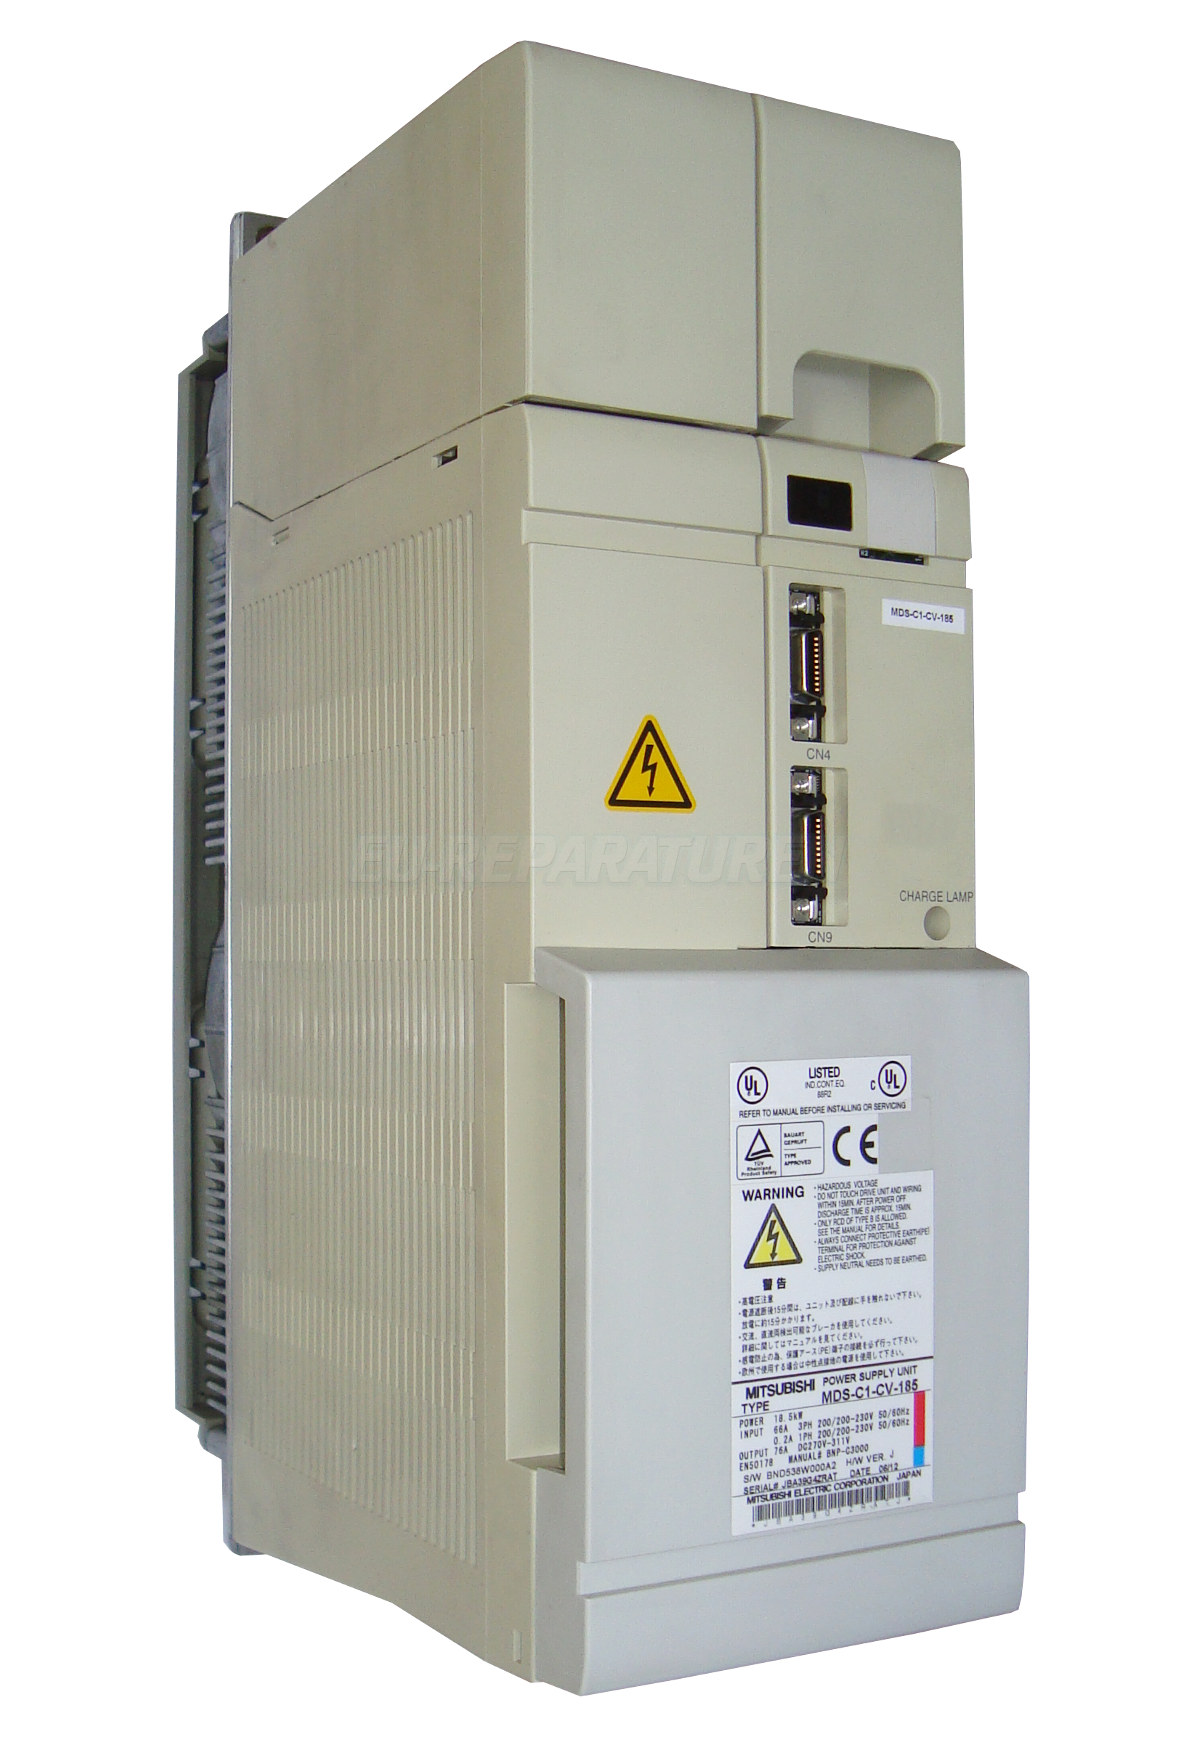 SERVICE MITSUBISHI MDS-C1-CV-185 POWER SUPPLY